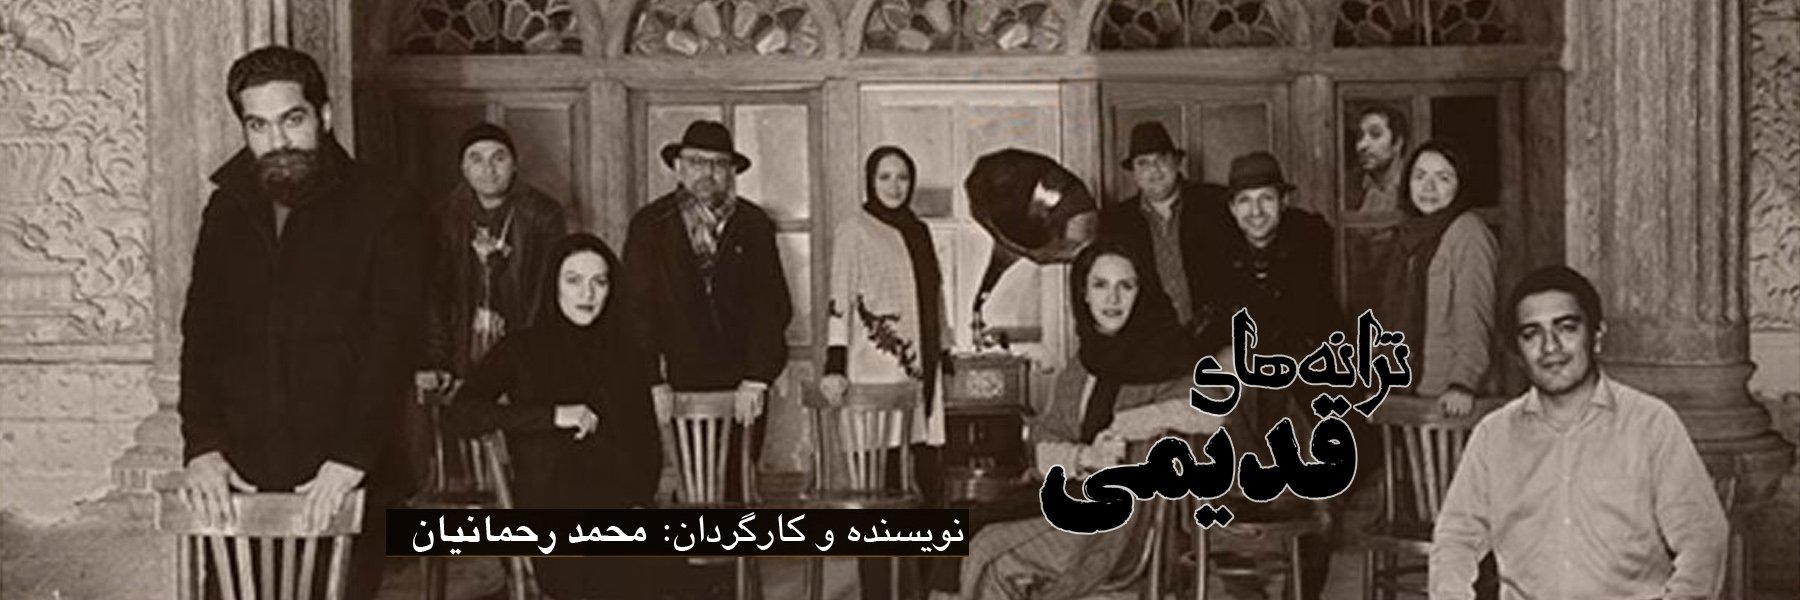 Old Songs (Taraneh-hay-e ghadimi)